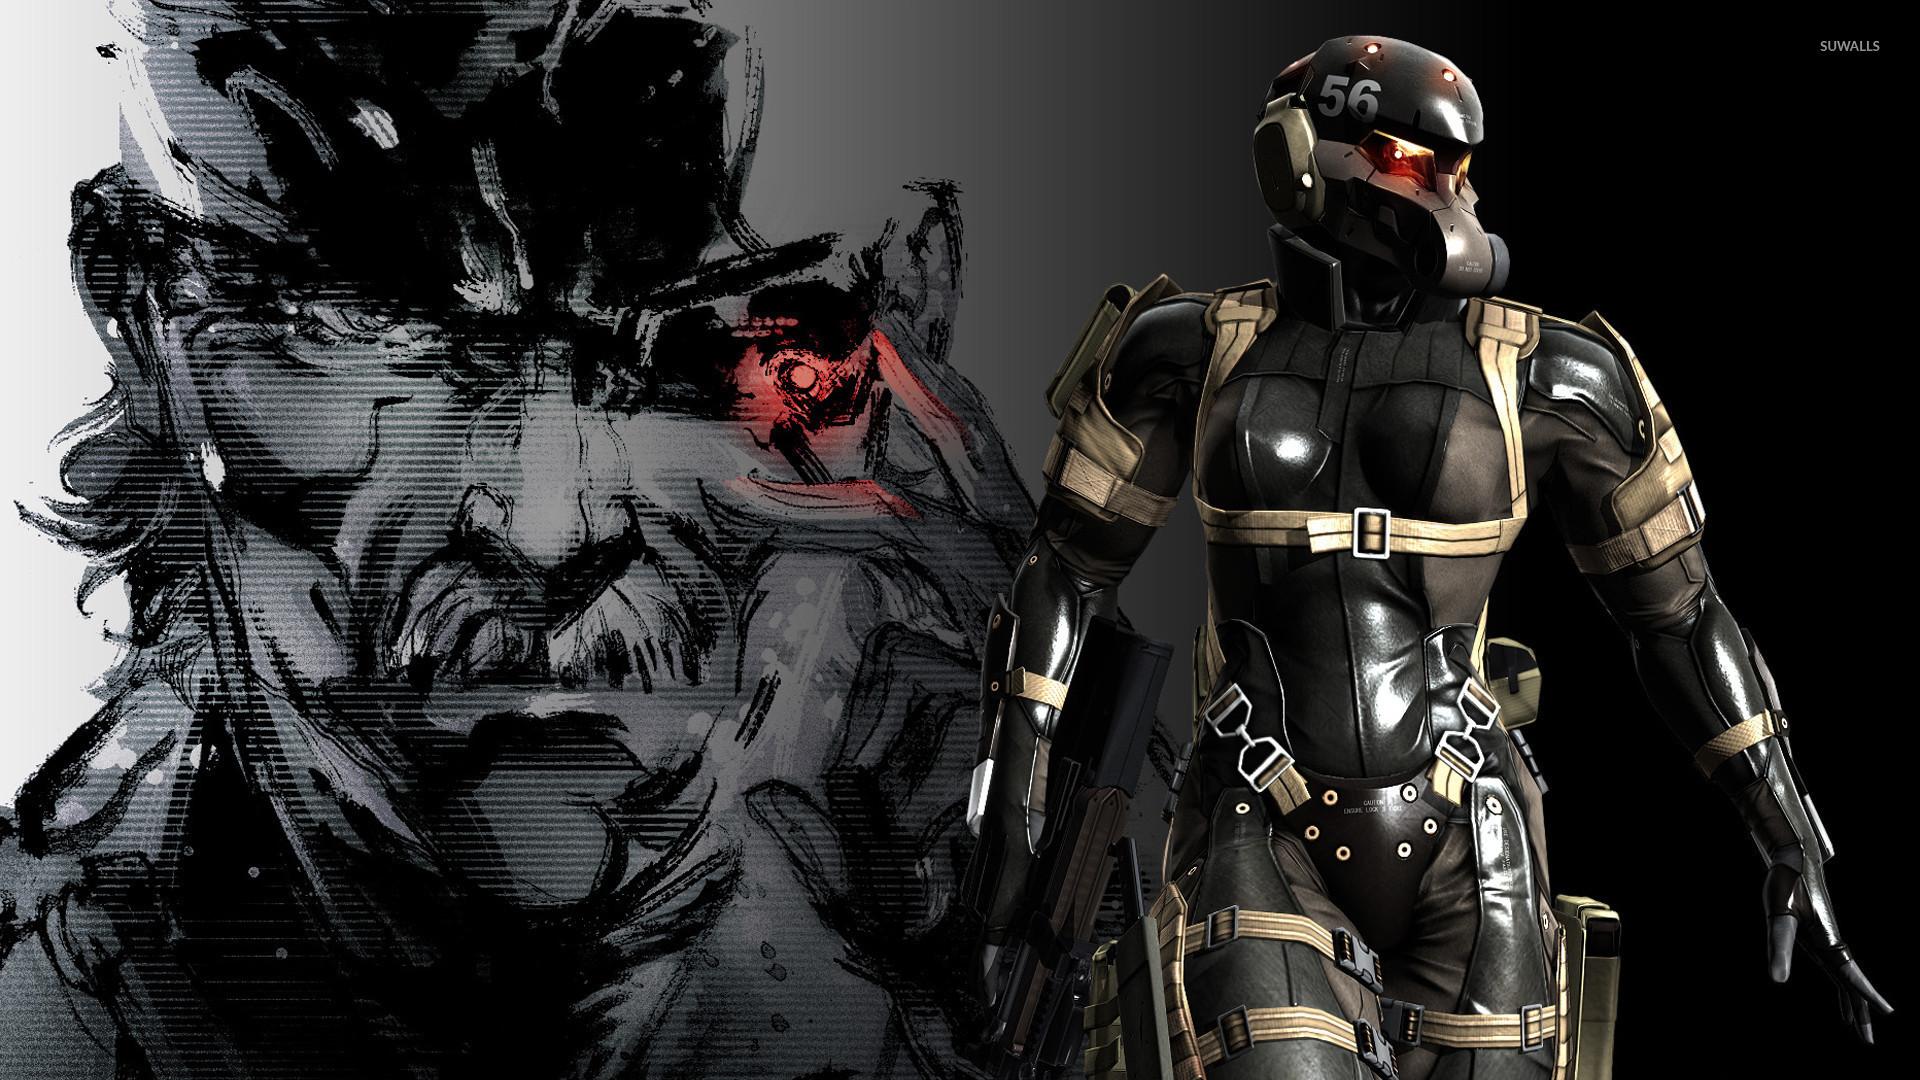 Metal Gear Solid Vi The Phantom Gabe by Fpew on DeviantArt